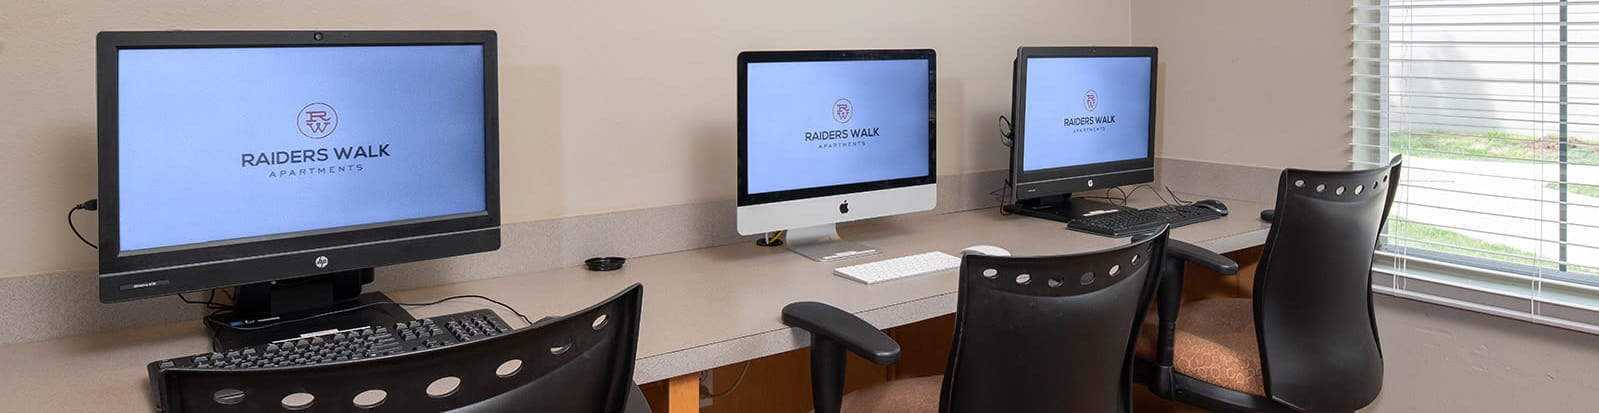 amenities at Raiders Walk Apartments